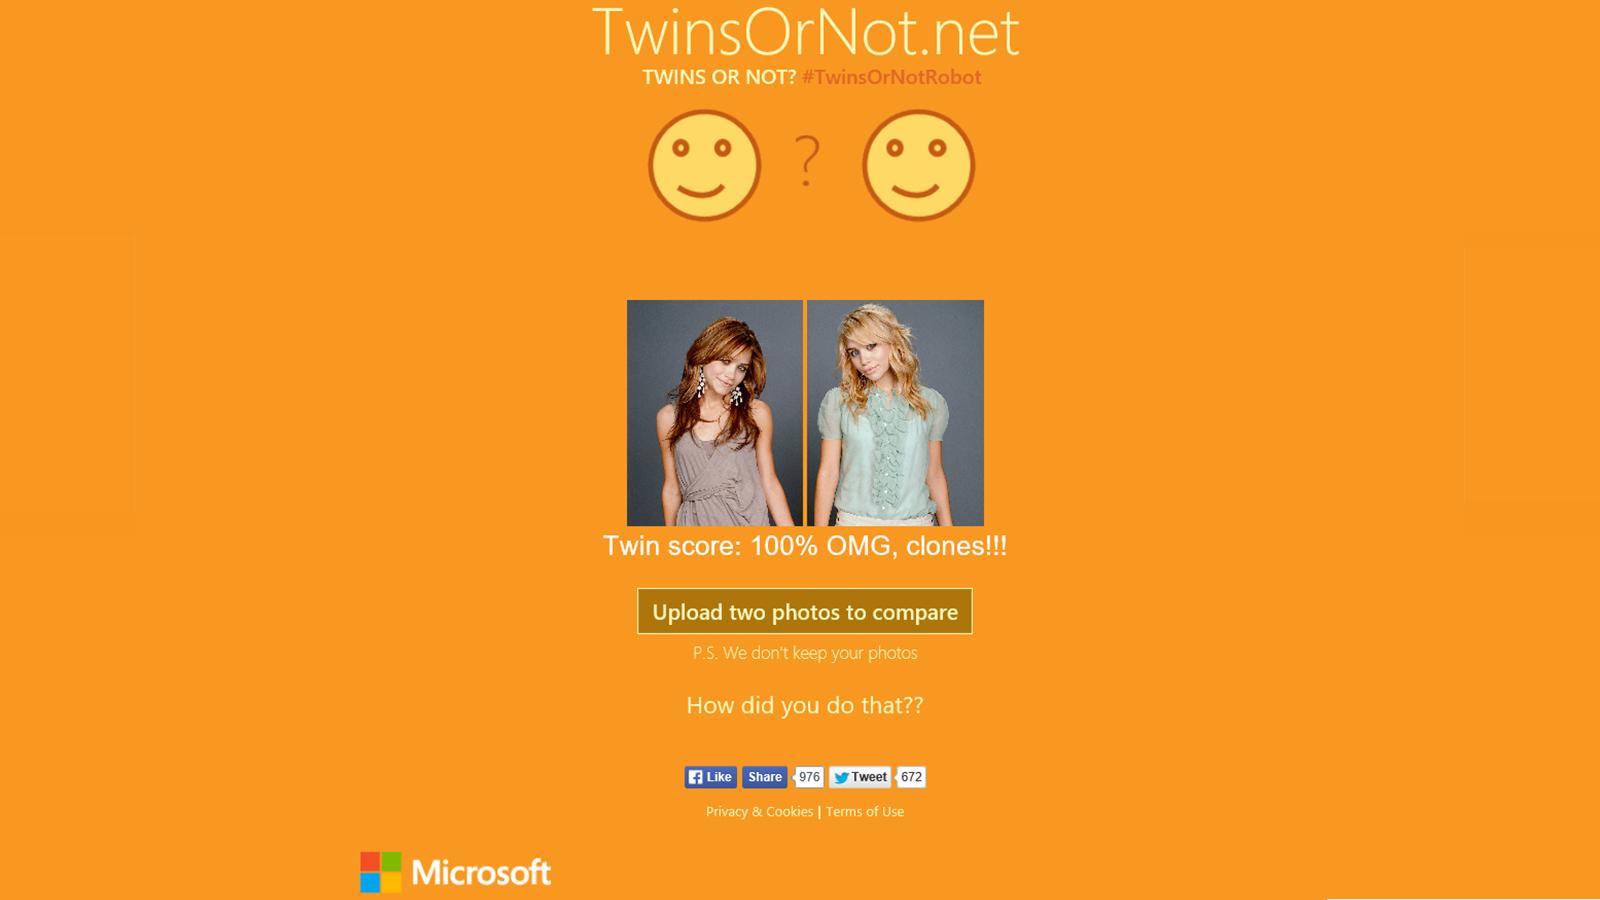 TwinsOrNotTest